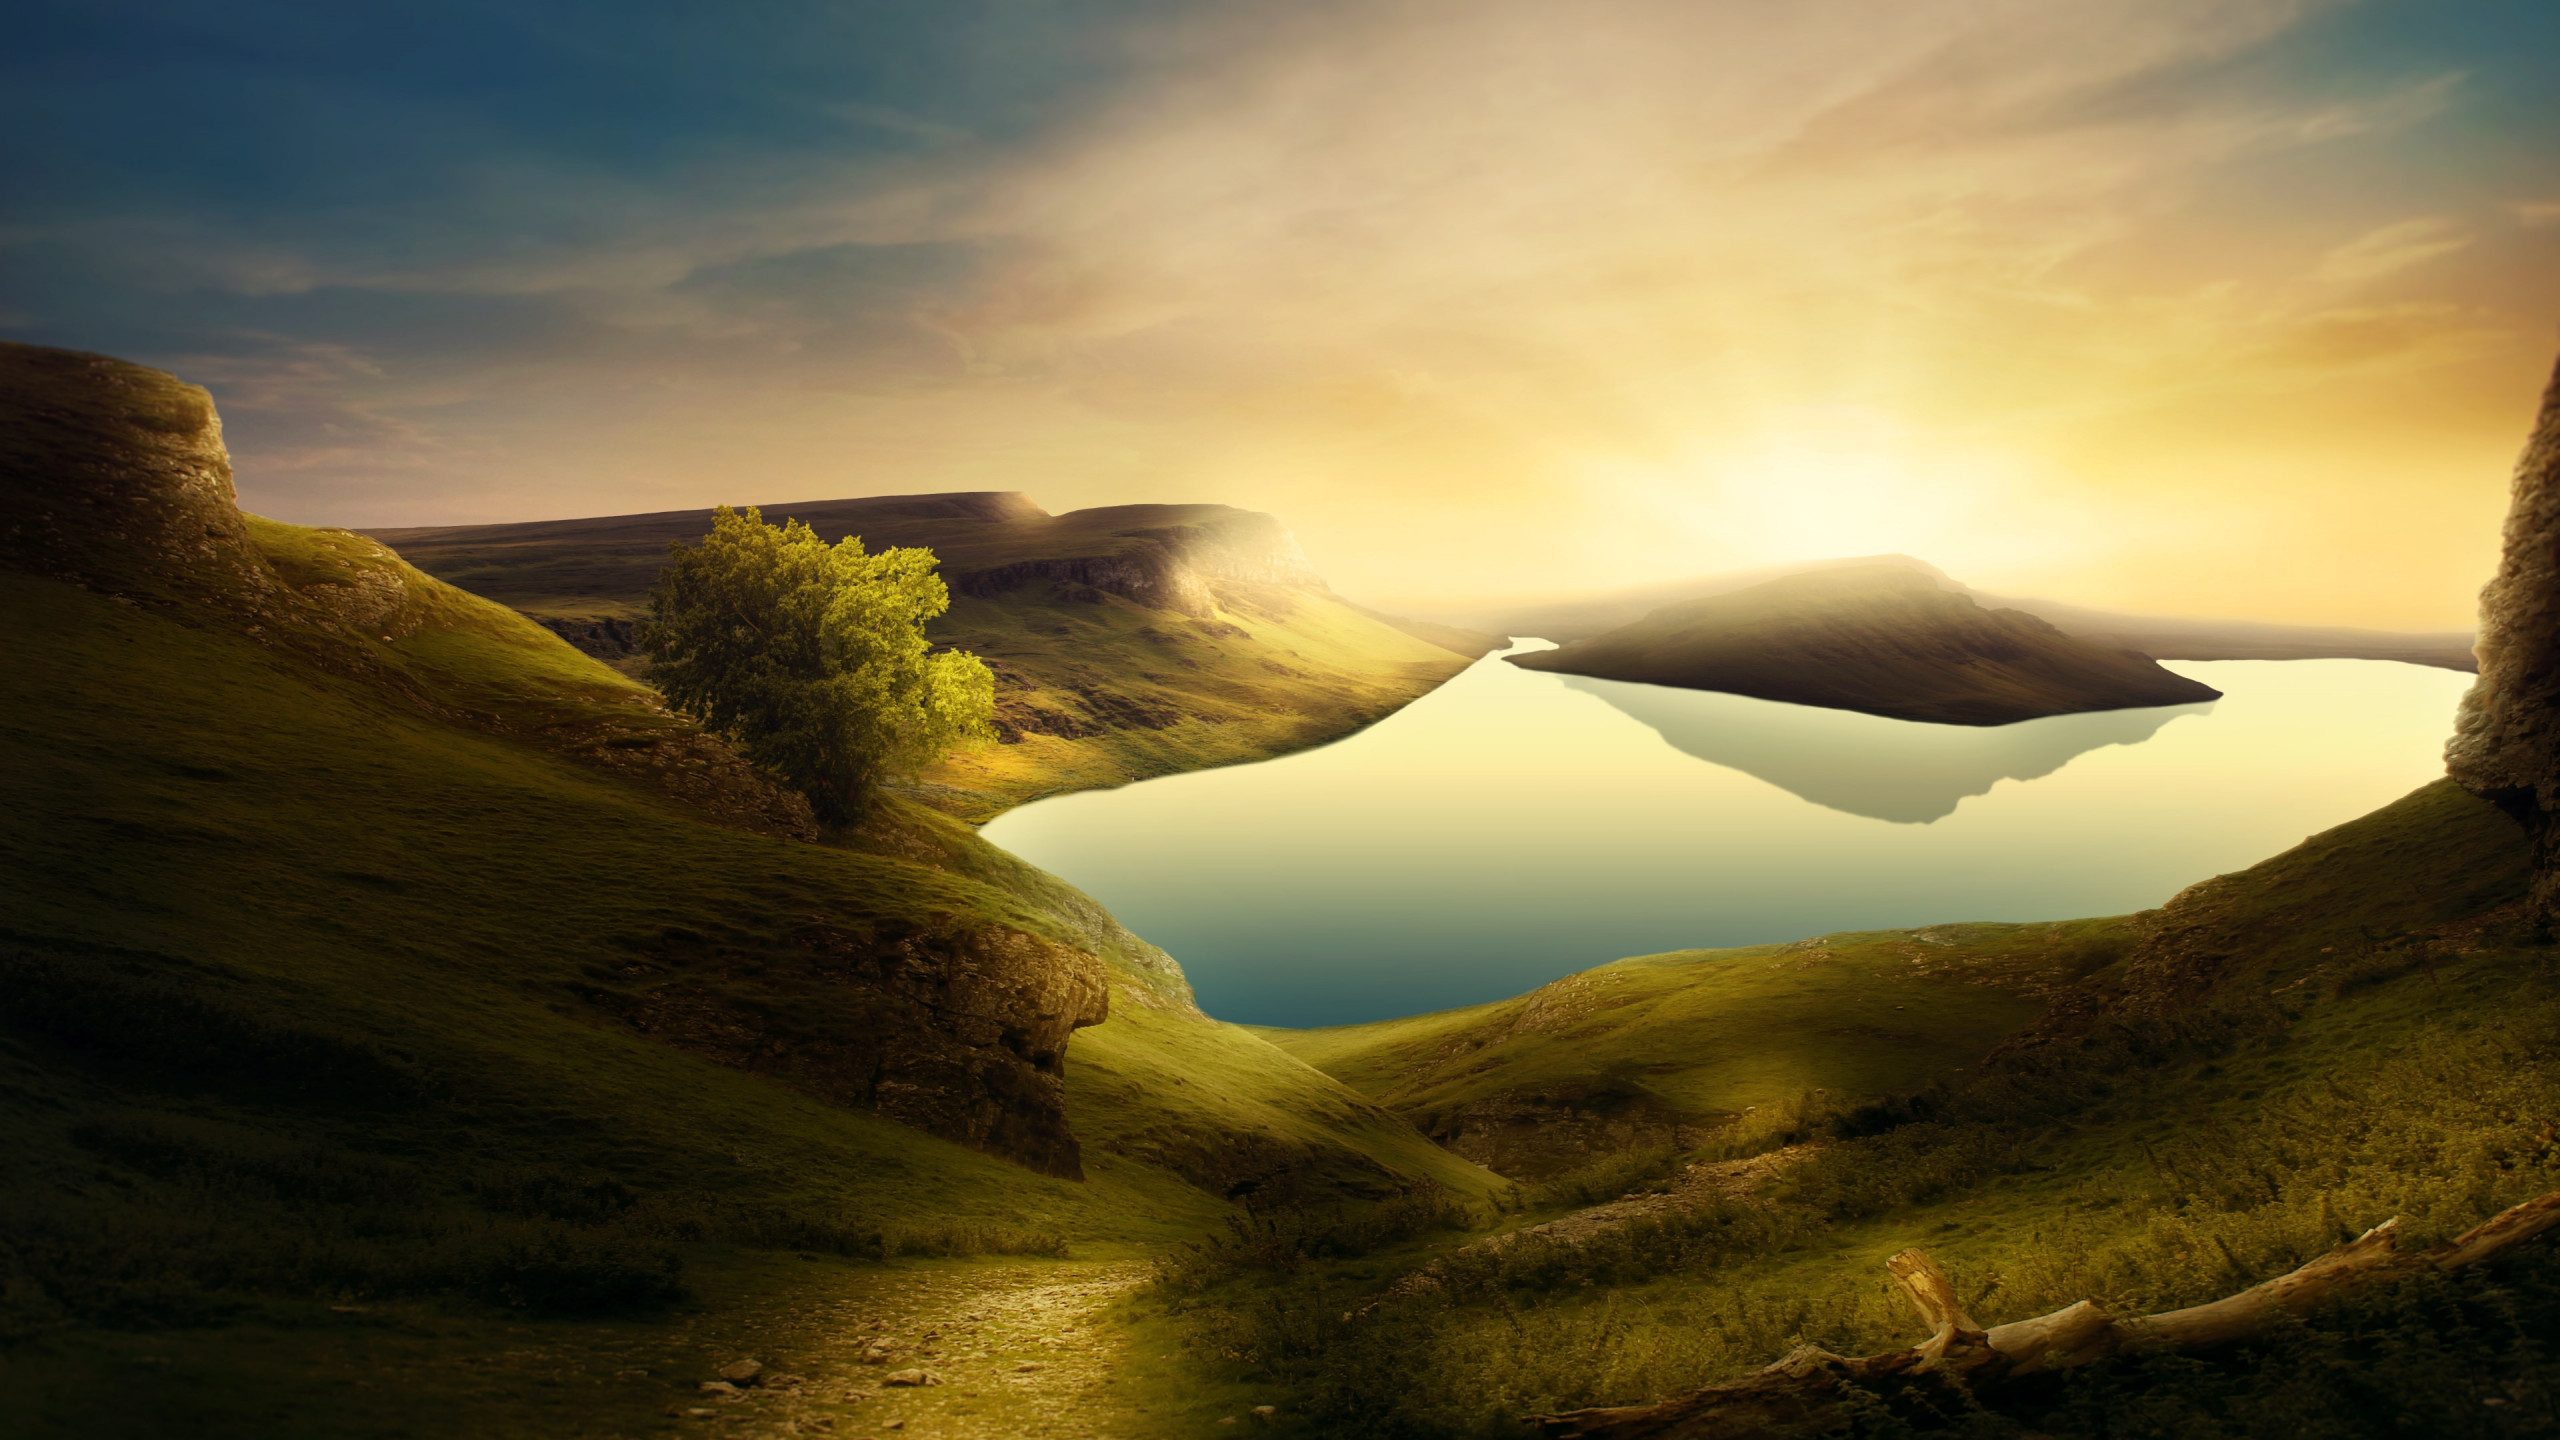 Download Wallpaper Dreamland Landscape 2560x1440